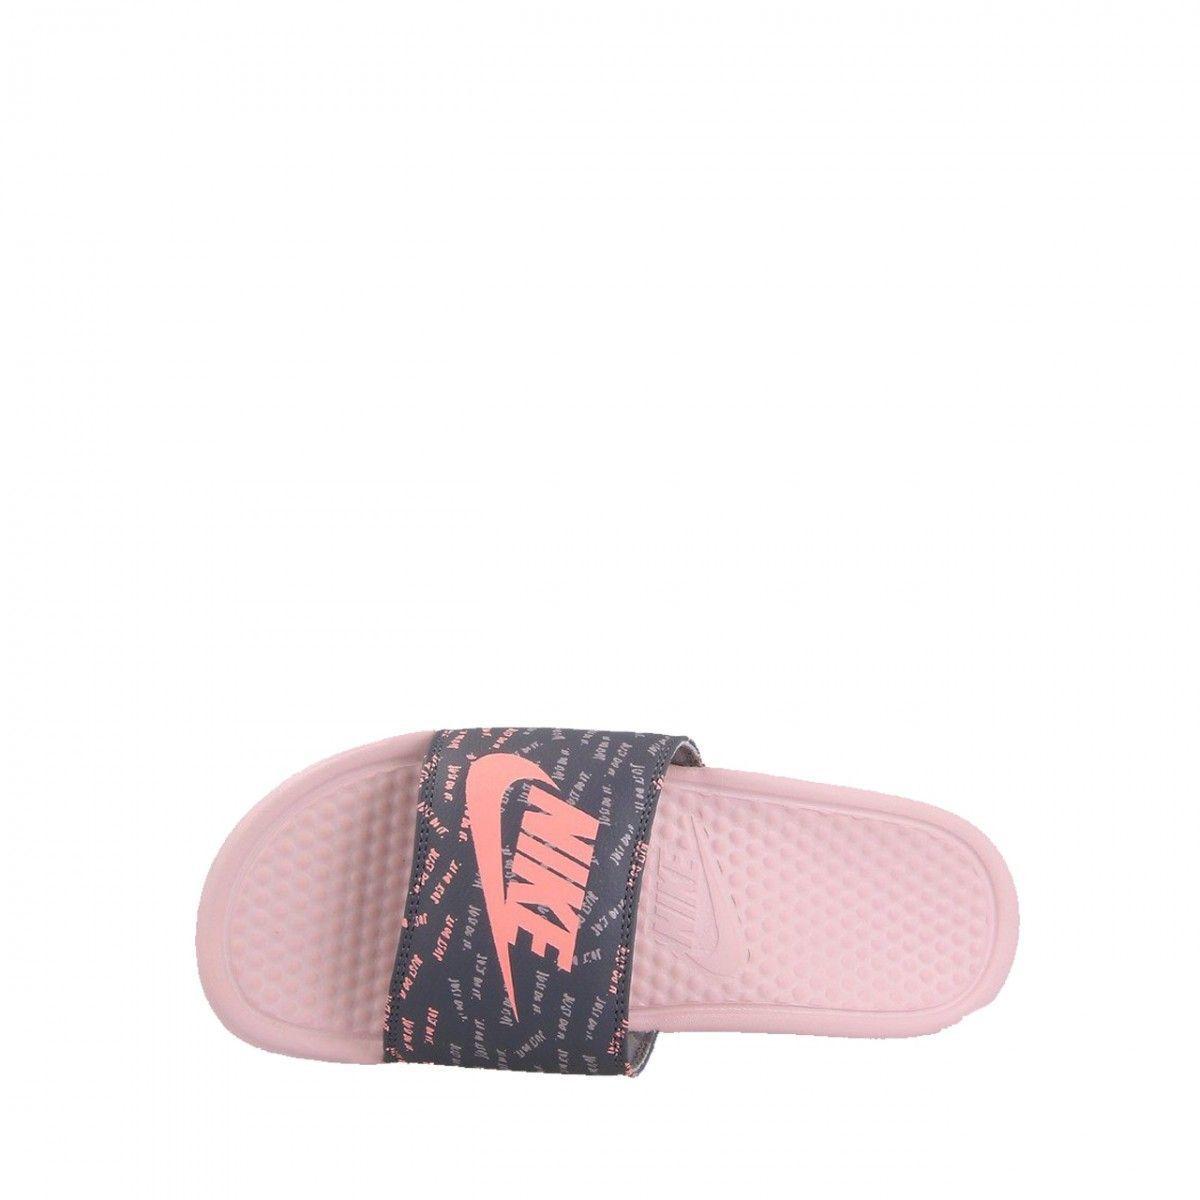 gros remise comparer les prix vif et grand en style Sandales Nike W Benassi Just Do It - Ref. 618919-605 ...